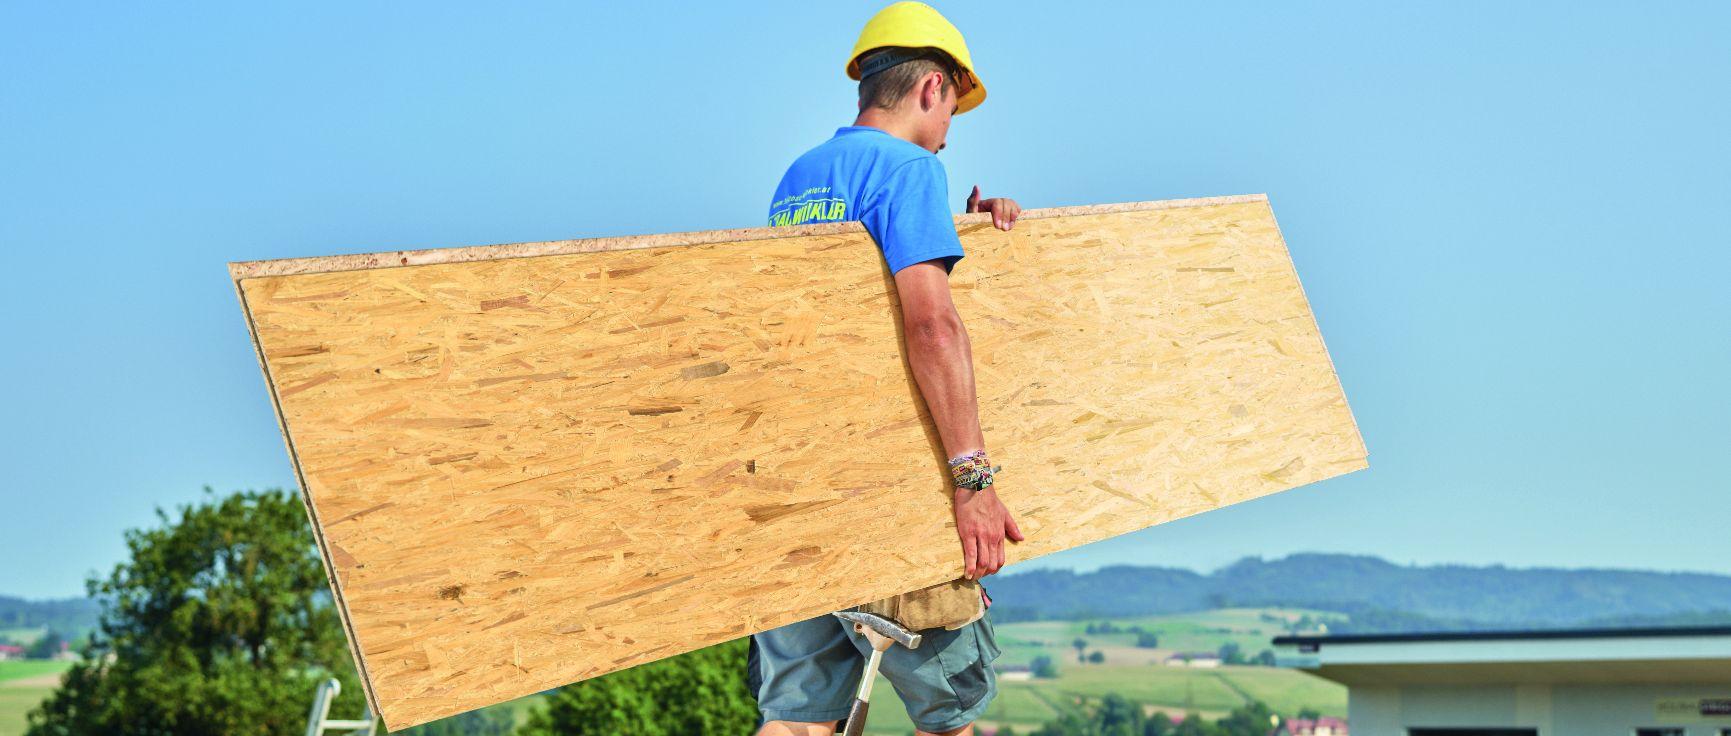 02PI_AP_PH_bui_roofing_board_installation_01_1731x736_new.jpg